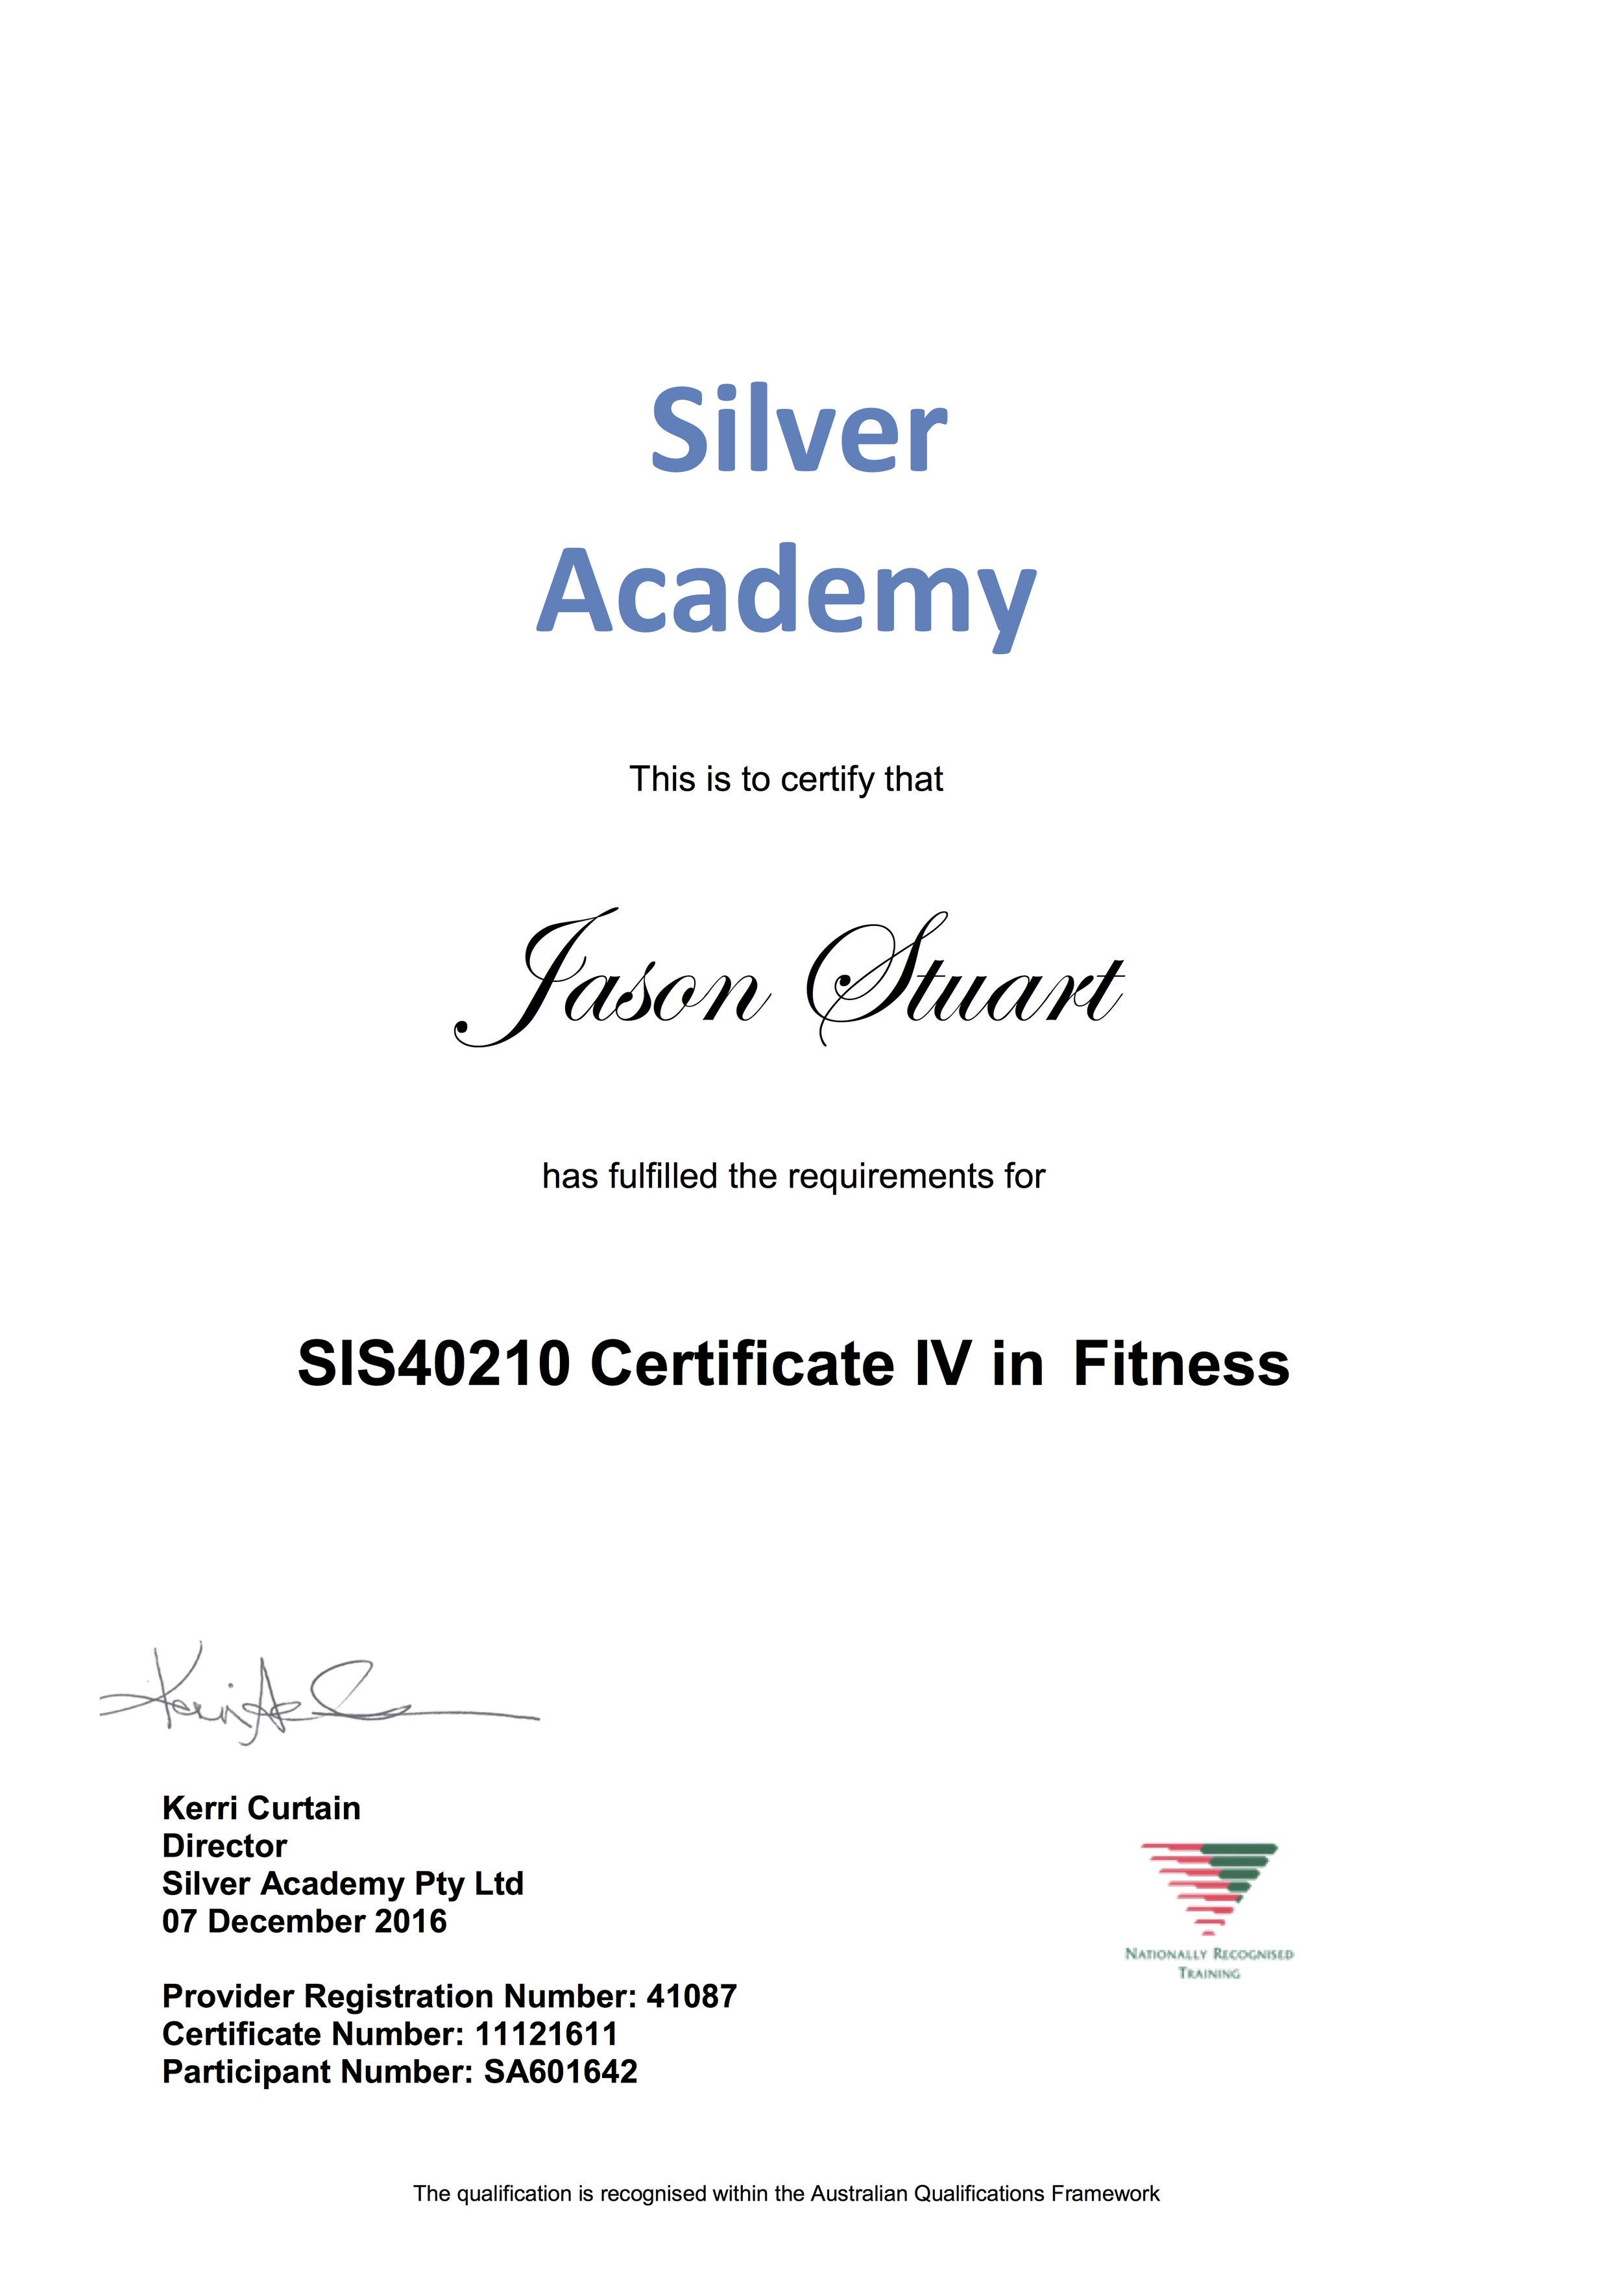 Certificate IV in Fitness.jpg